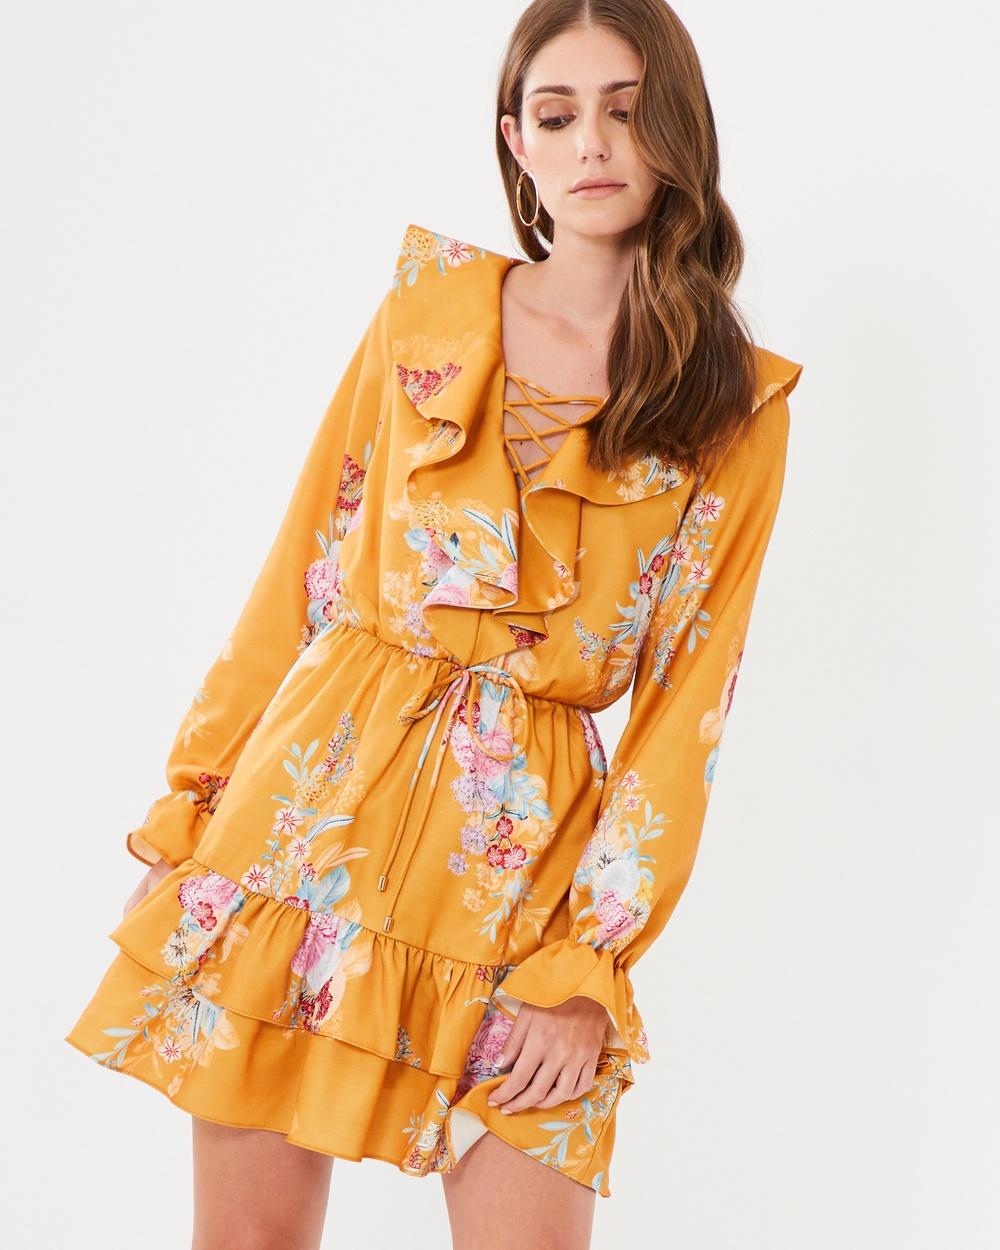 CHANCERY Regina Frill Dress Dresses Marigold Botanical Dream Regina Frill Dress